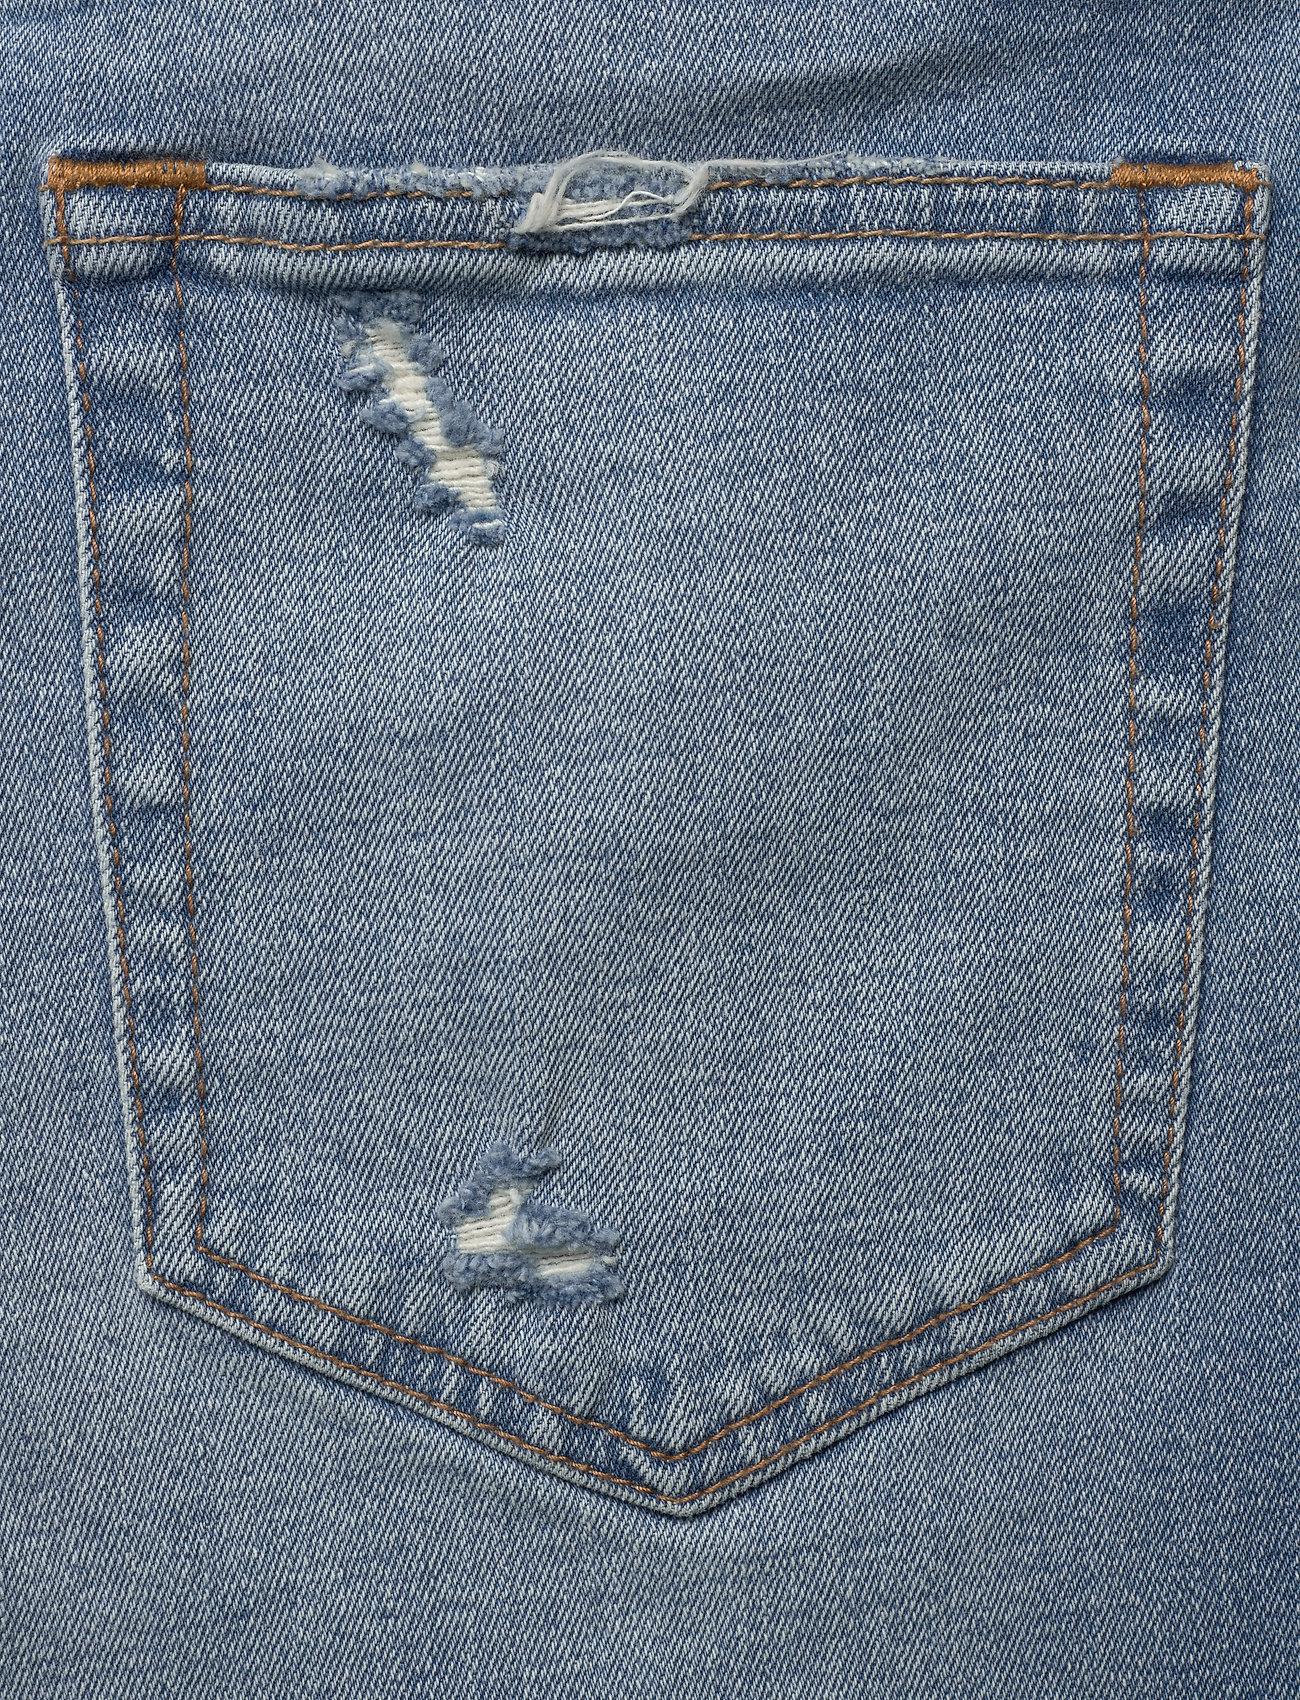 Abercrombie & Fitch Jeans (Medium), 460.85